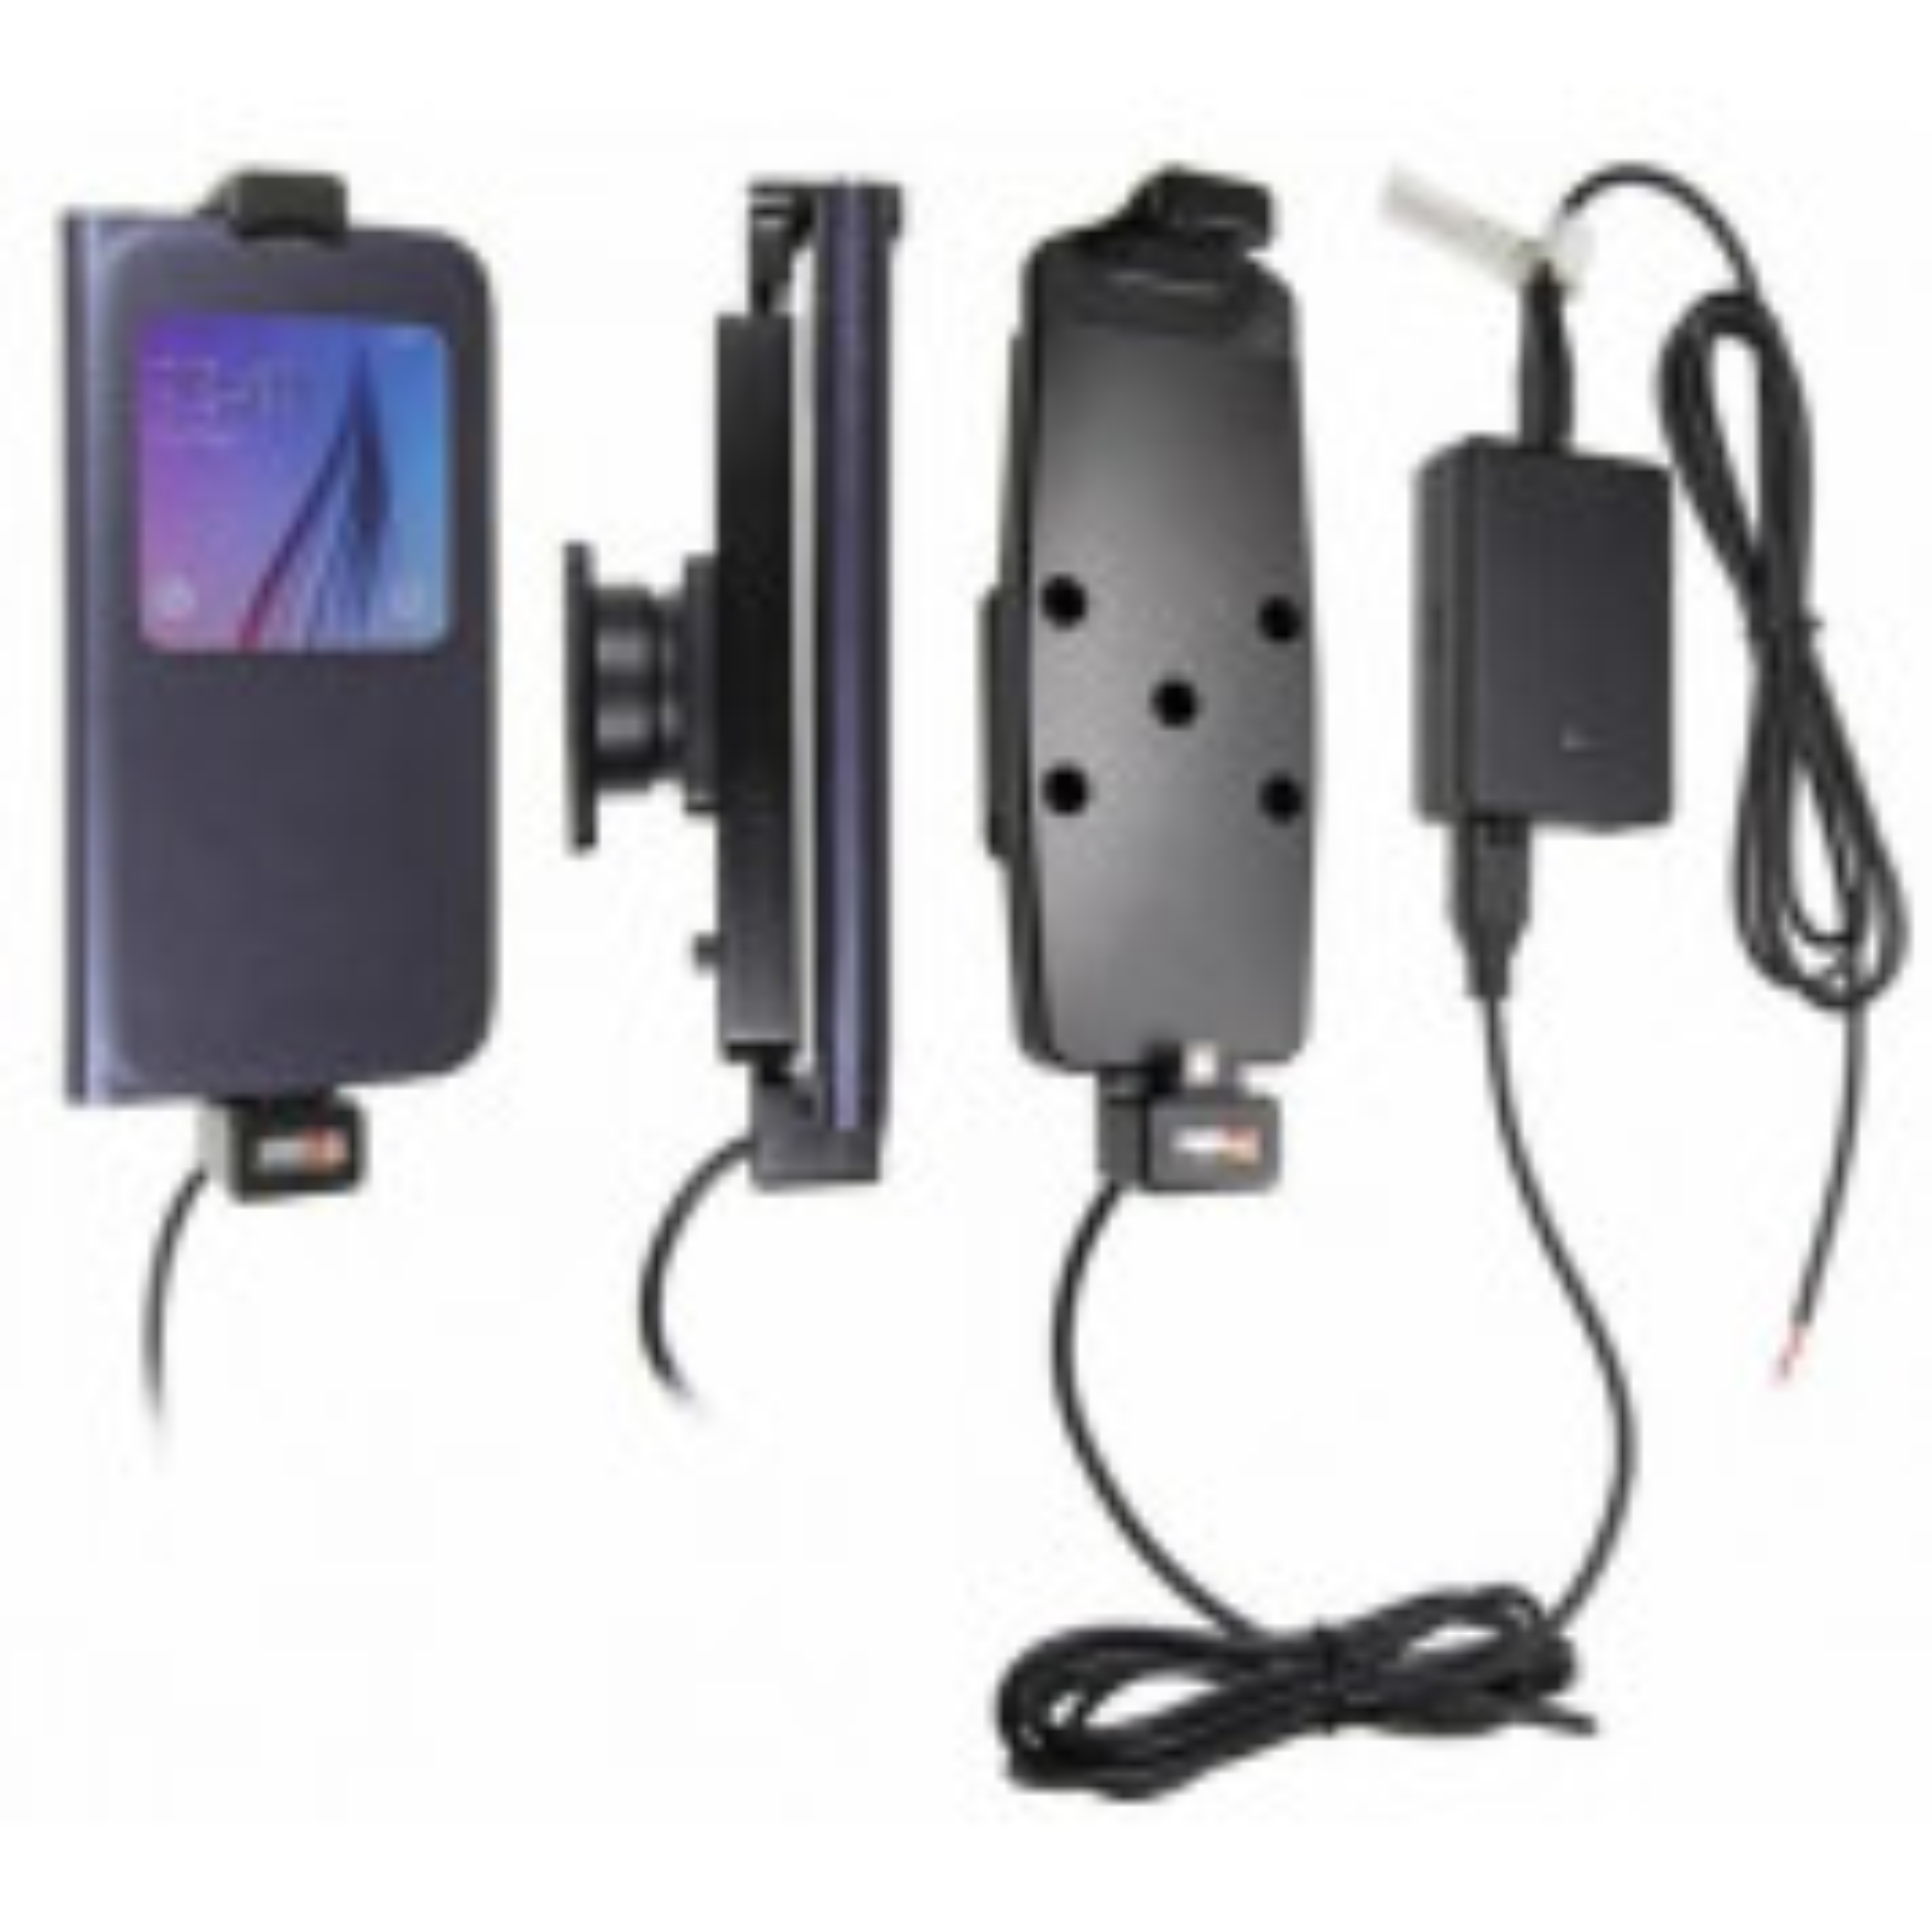 Brodit Samsung Galaxy S6, S6 Edge og S7 med beskyttelsescover - Faststrøms Aktiv Holder